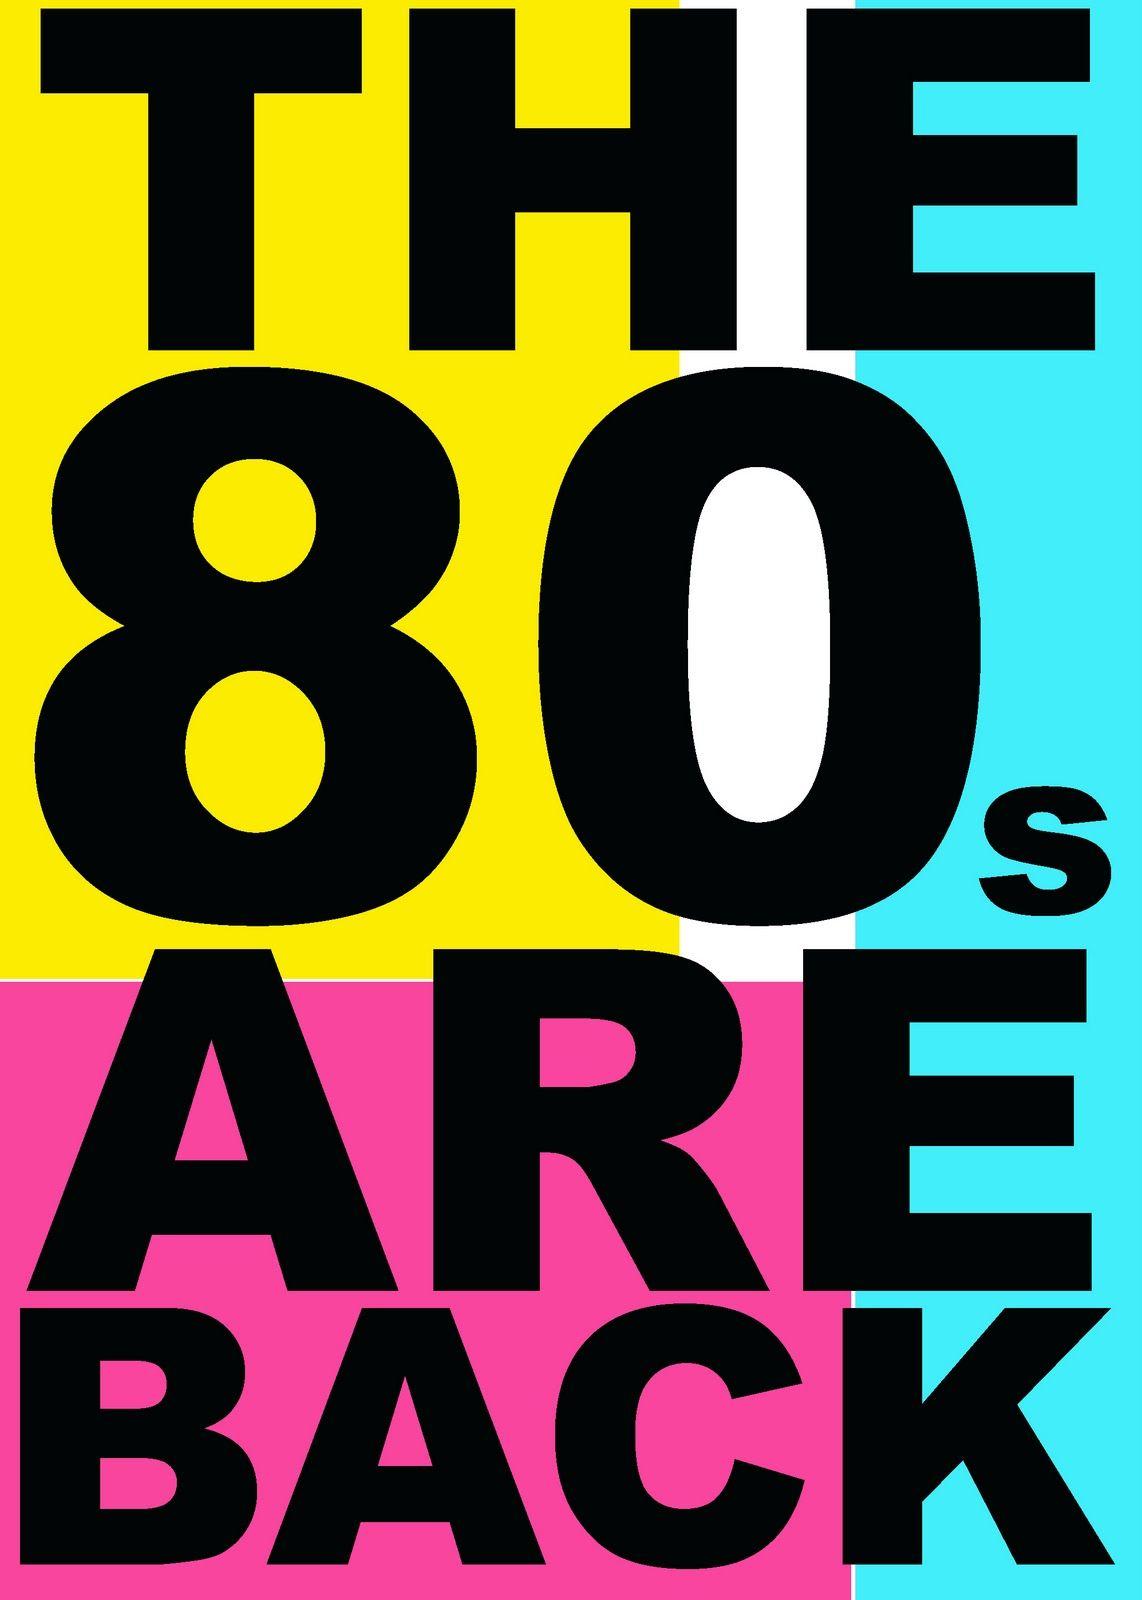 Totally! 80s songs list, 80s pop, 80s theme